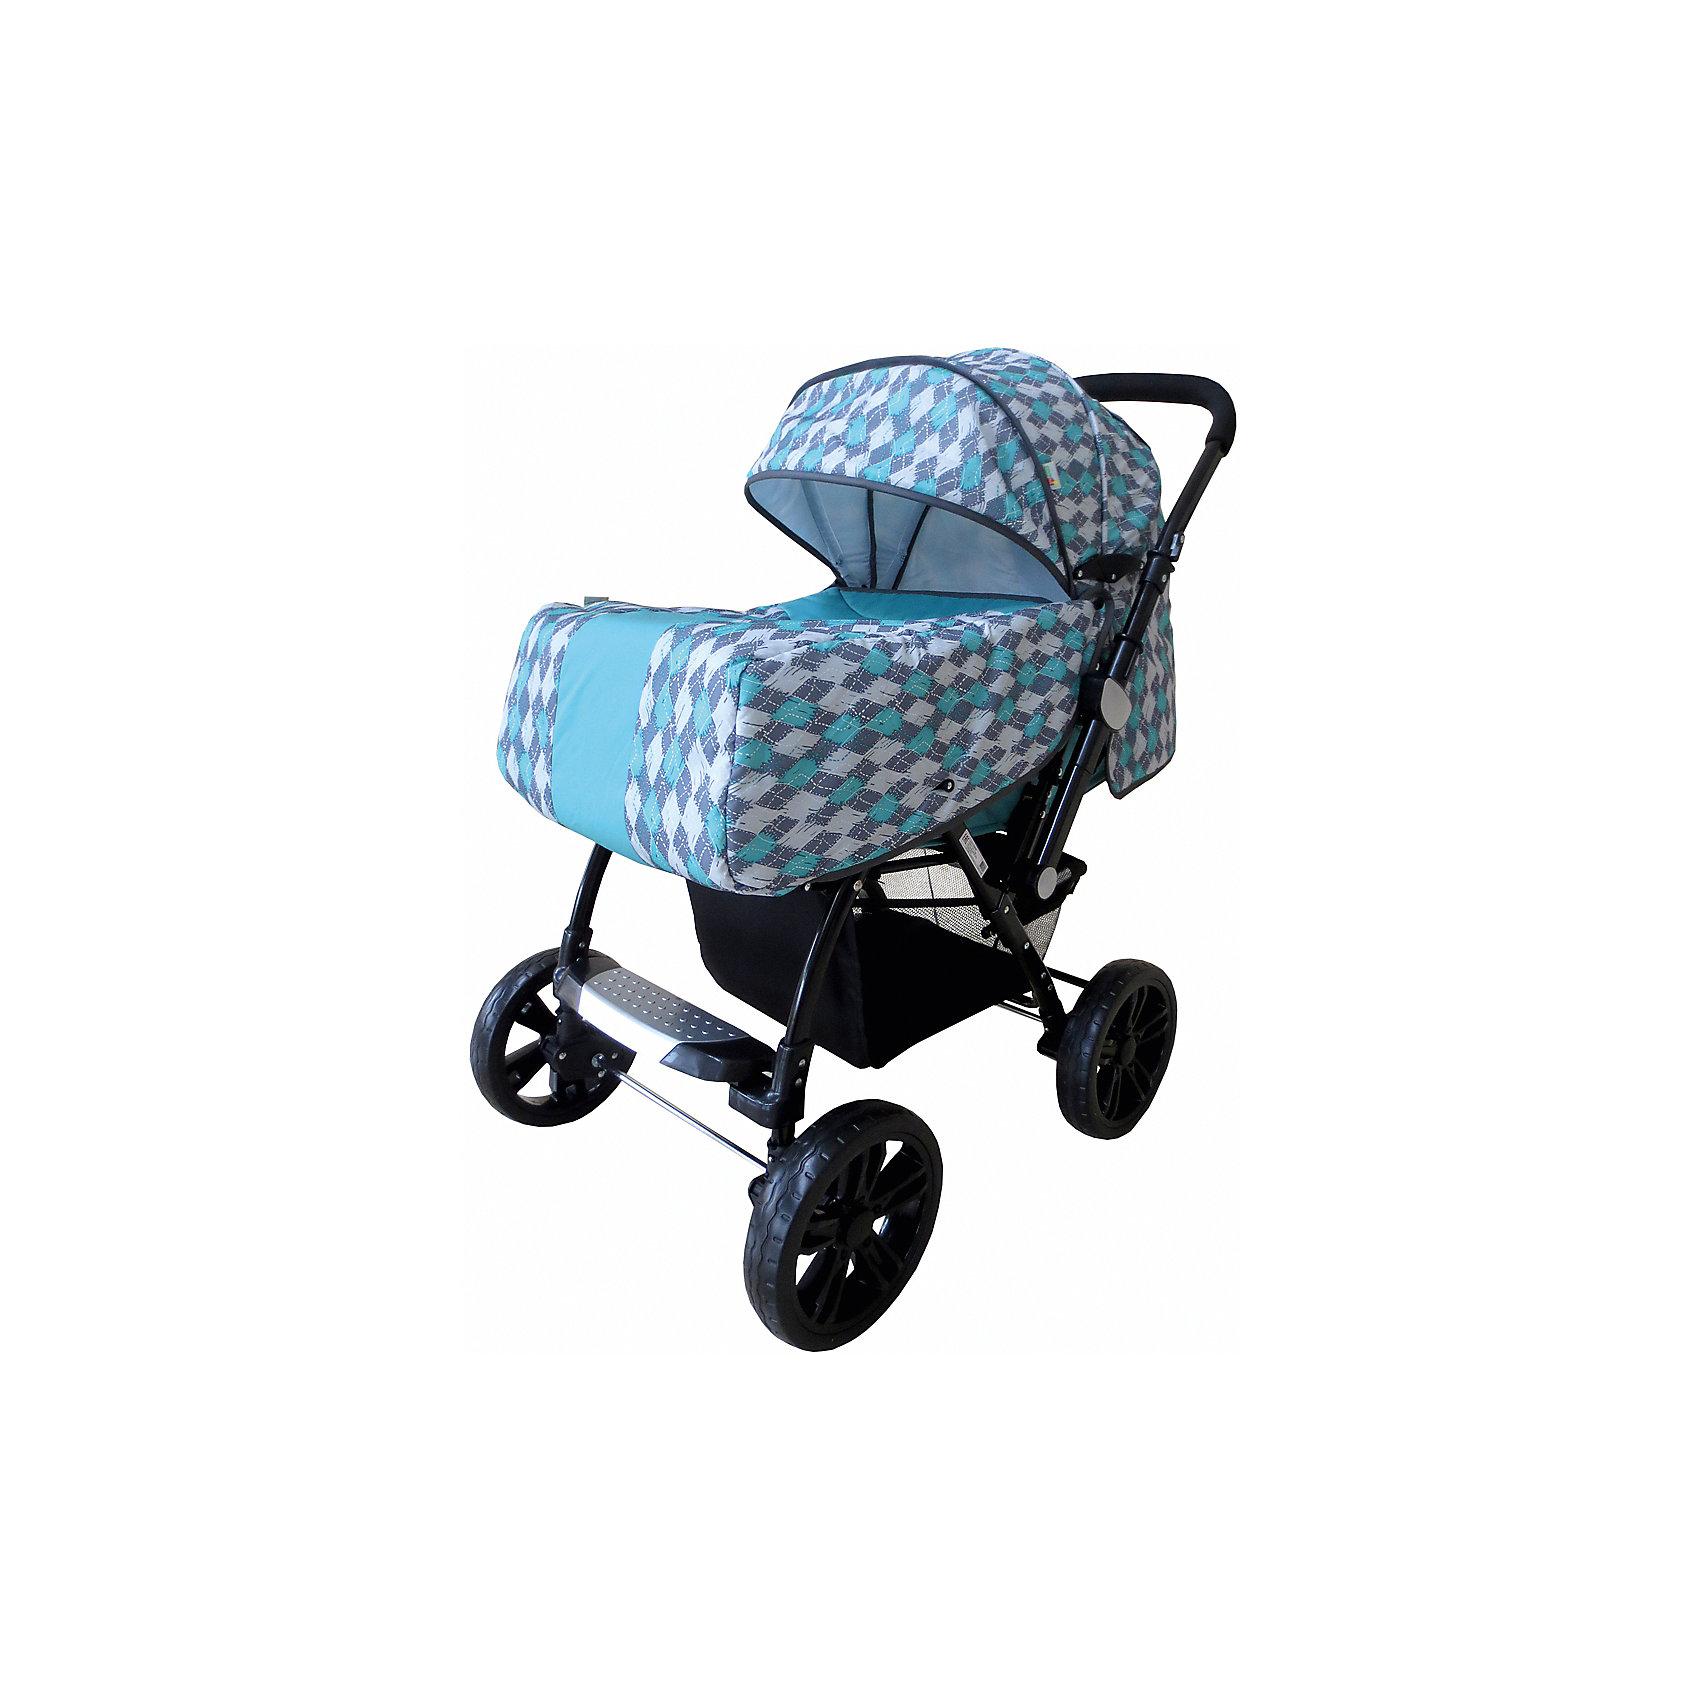 Baby Hit Прогулочная коляска Country MARINE, Babyhit, голубой автодома на колесах бу купить в испании